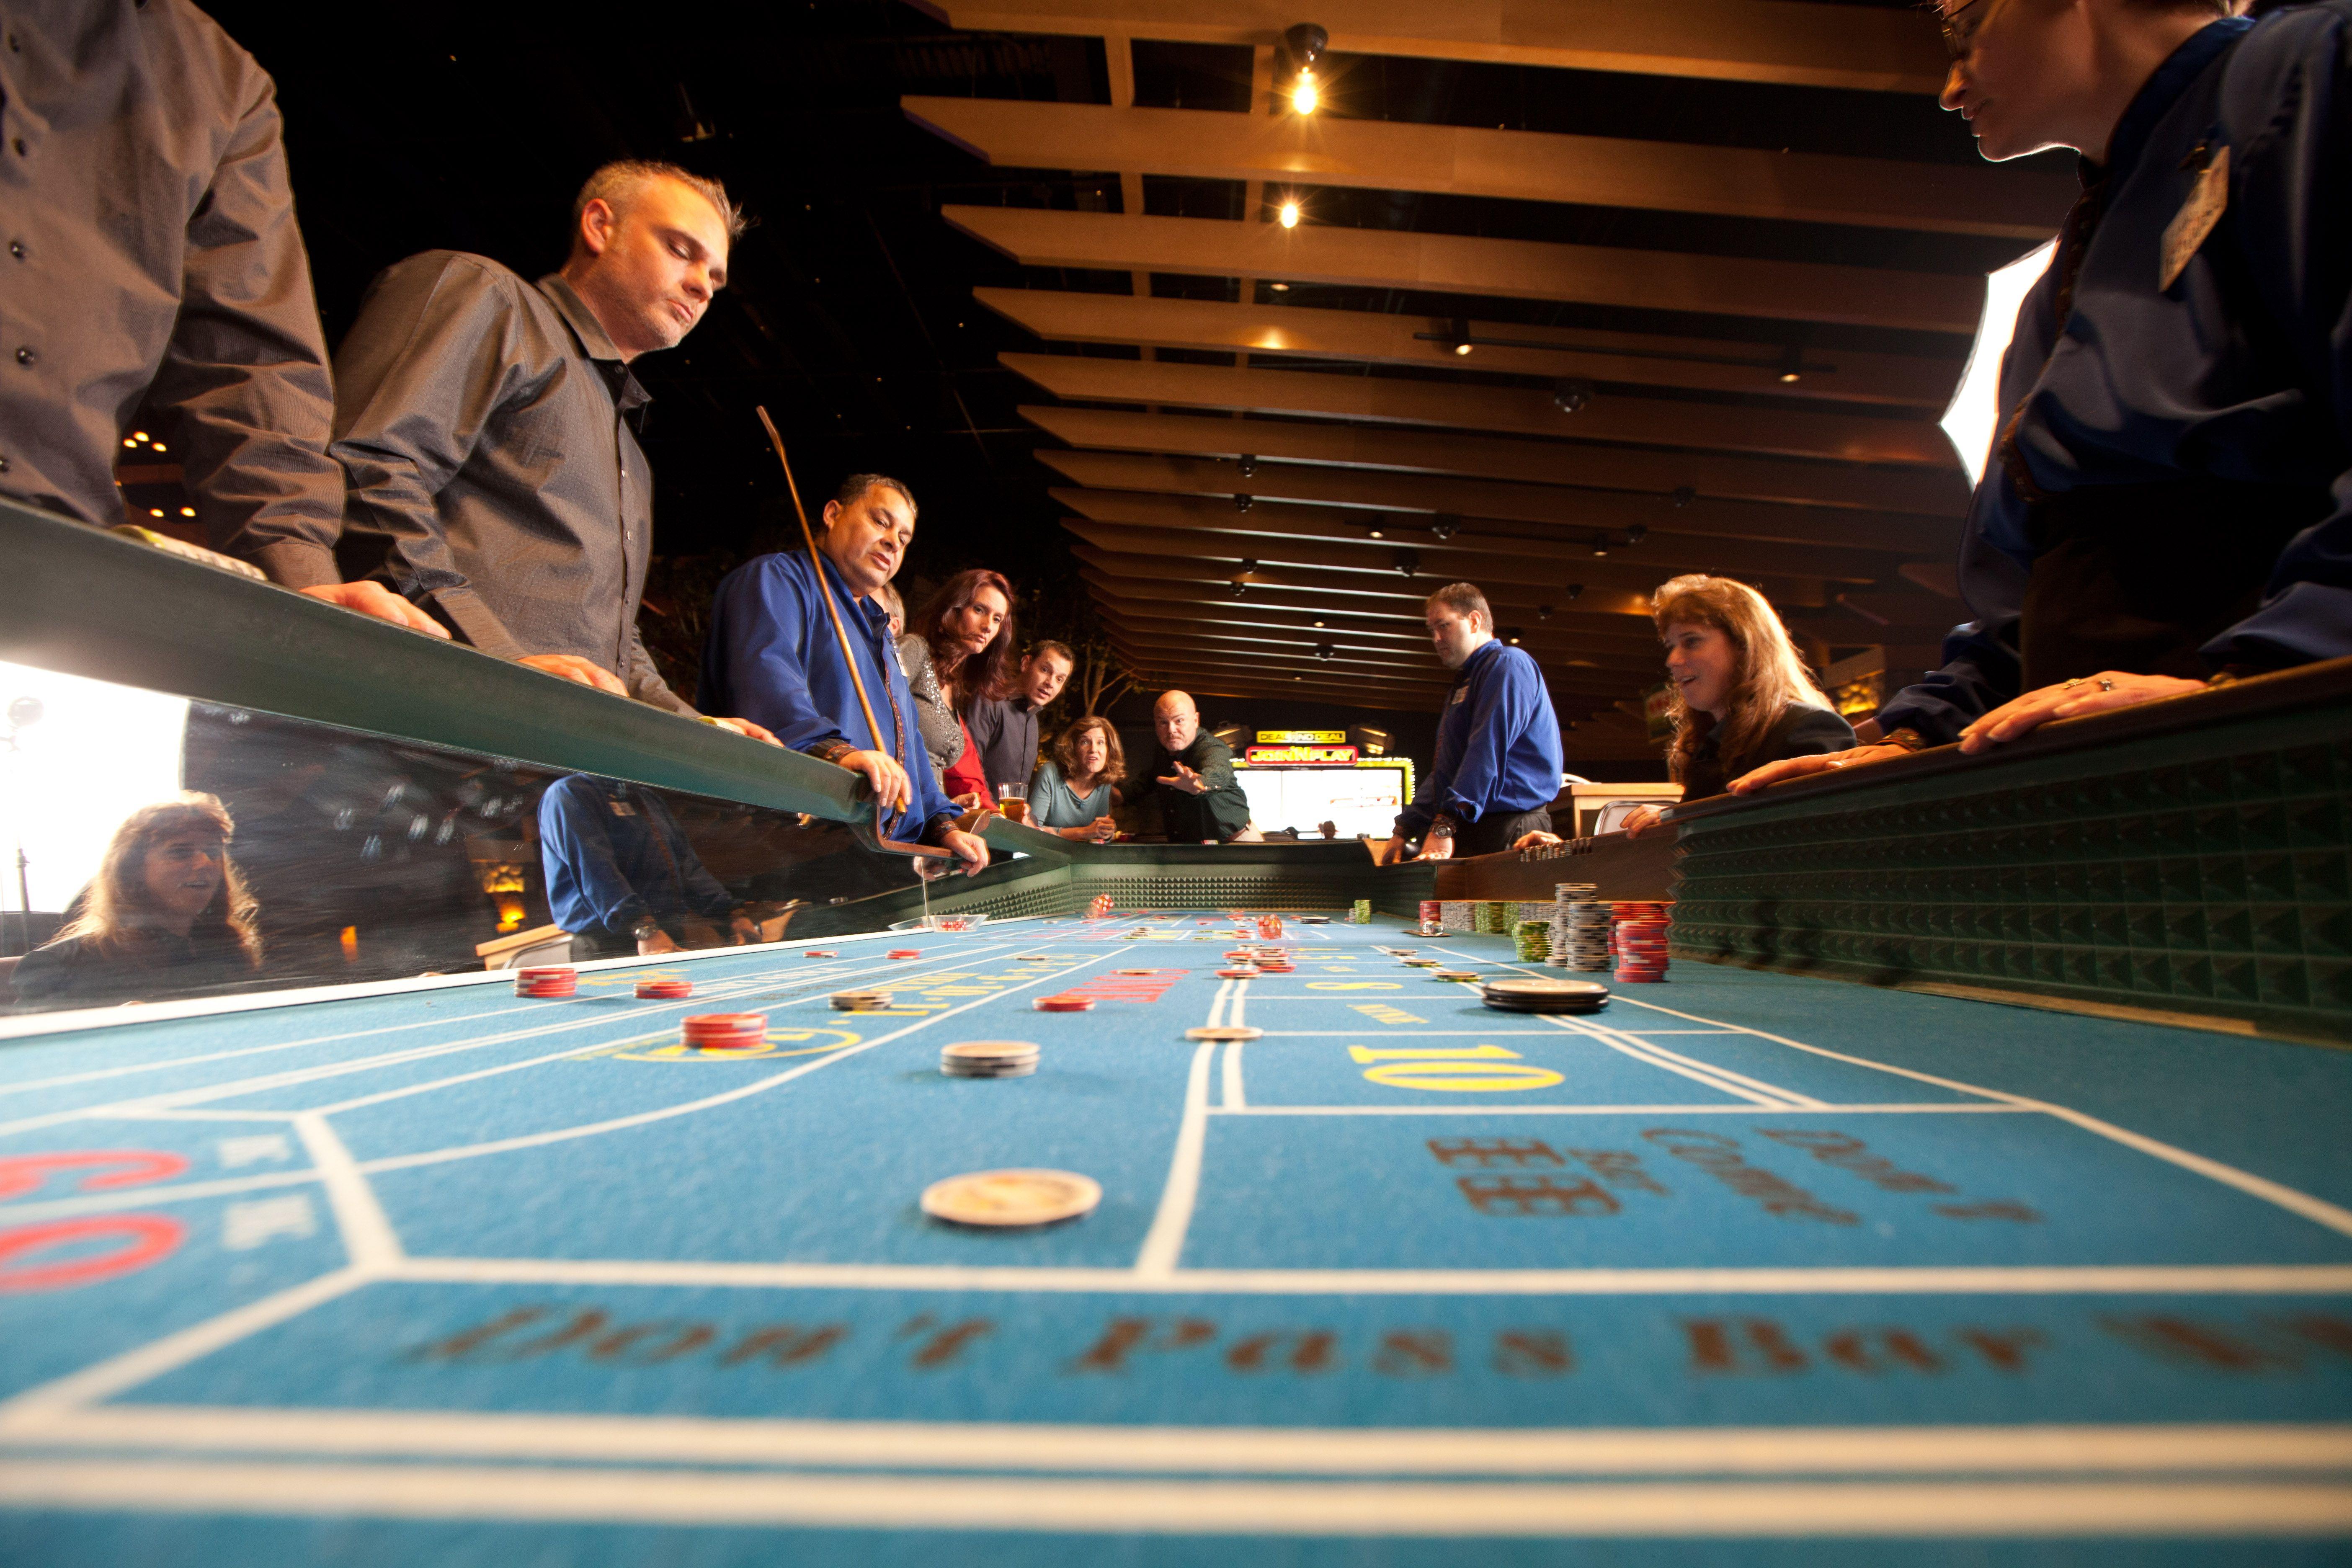 Gambling syndicates rules